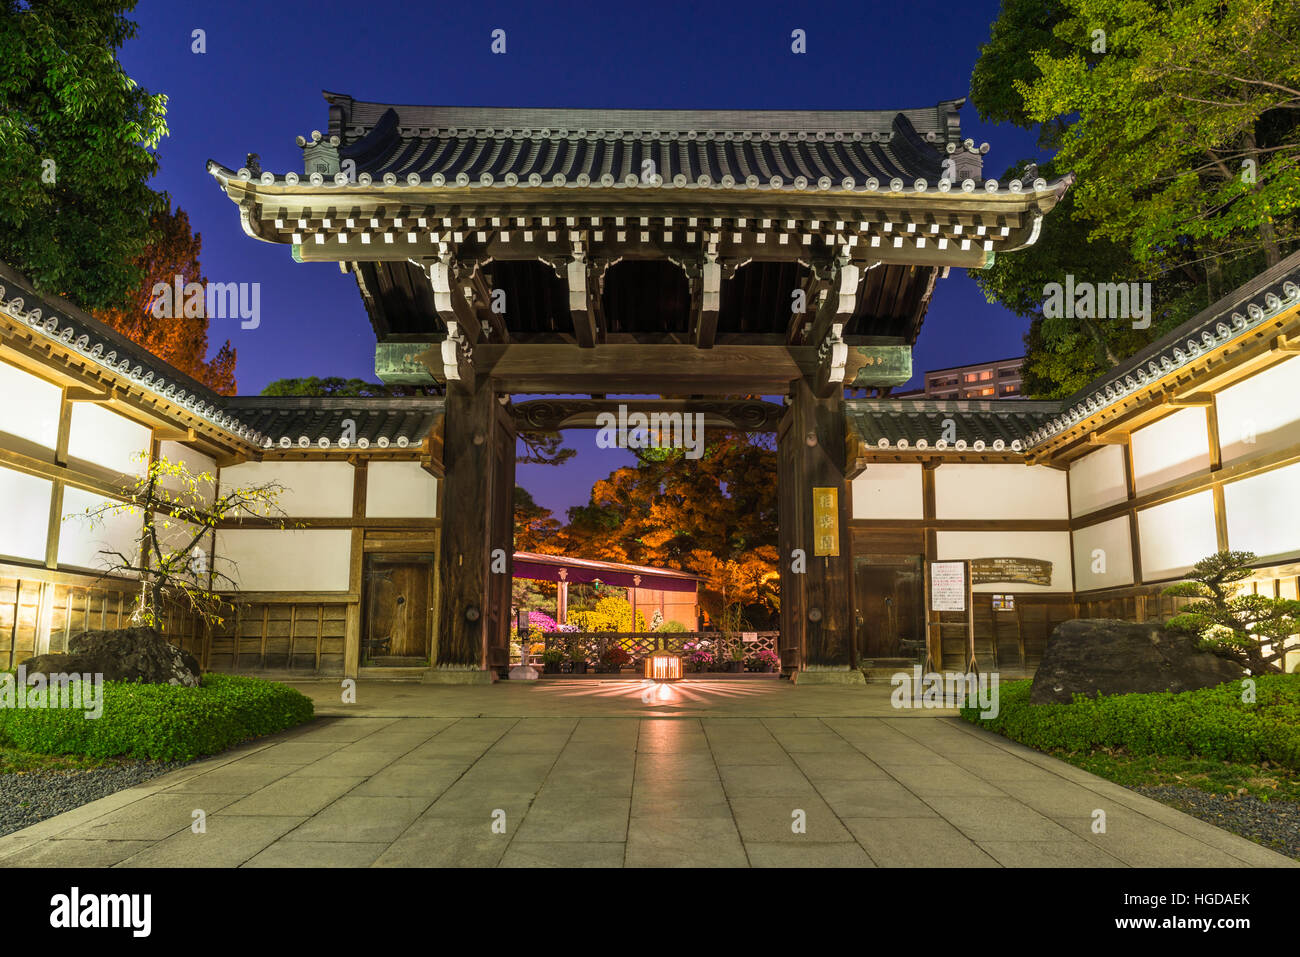 Entrance gate to Sorakuen Gardens, Kobe, Japan - Stock Image